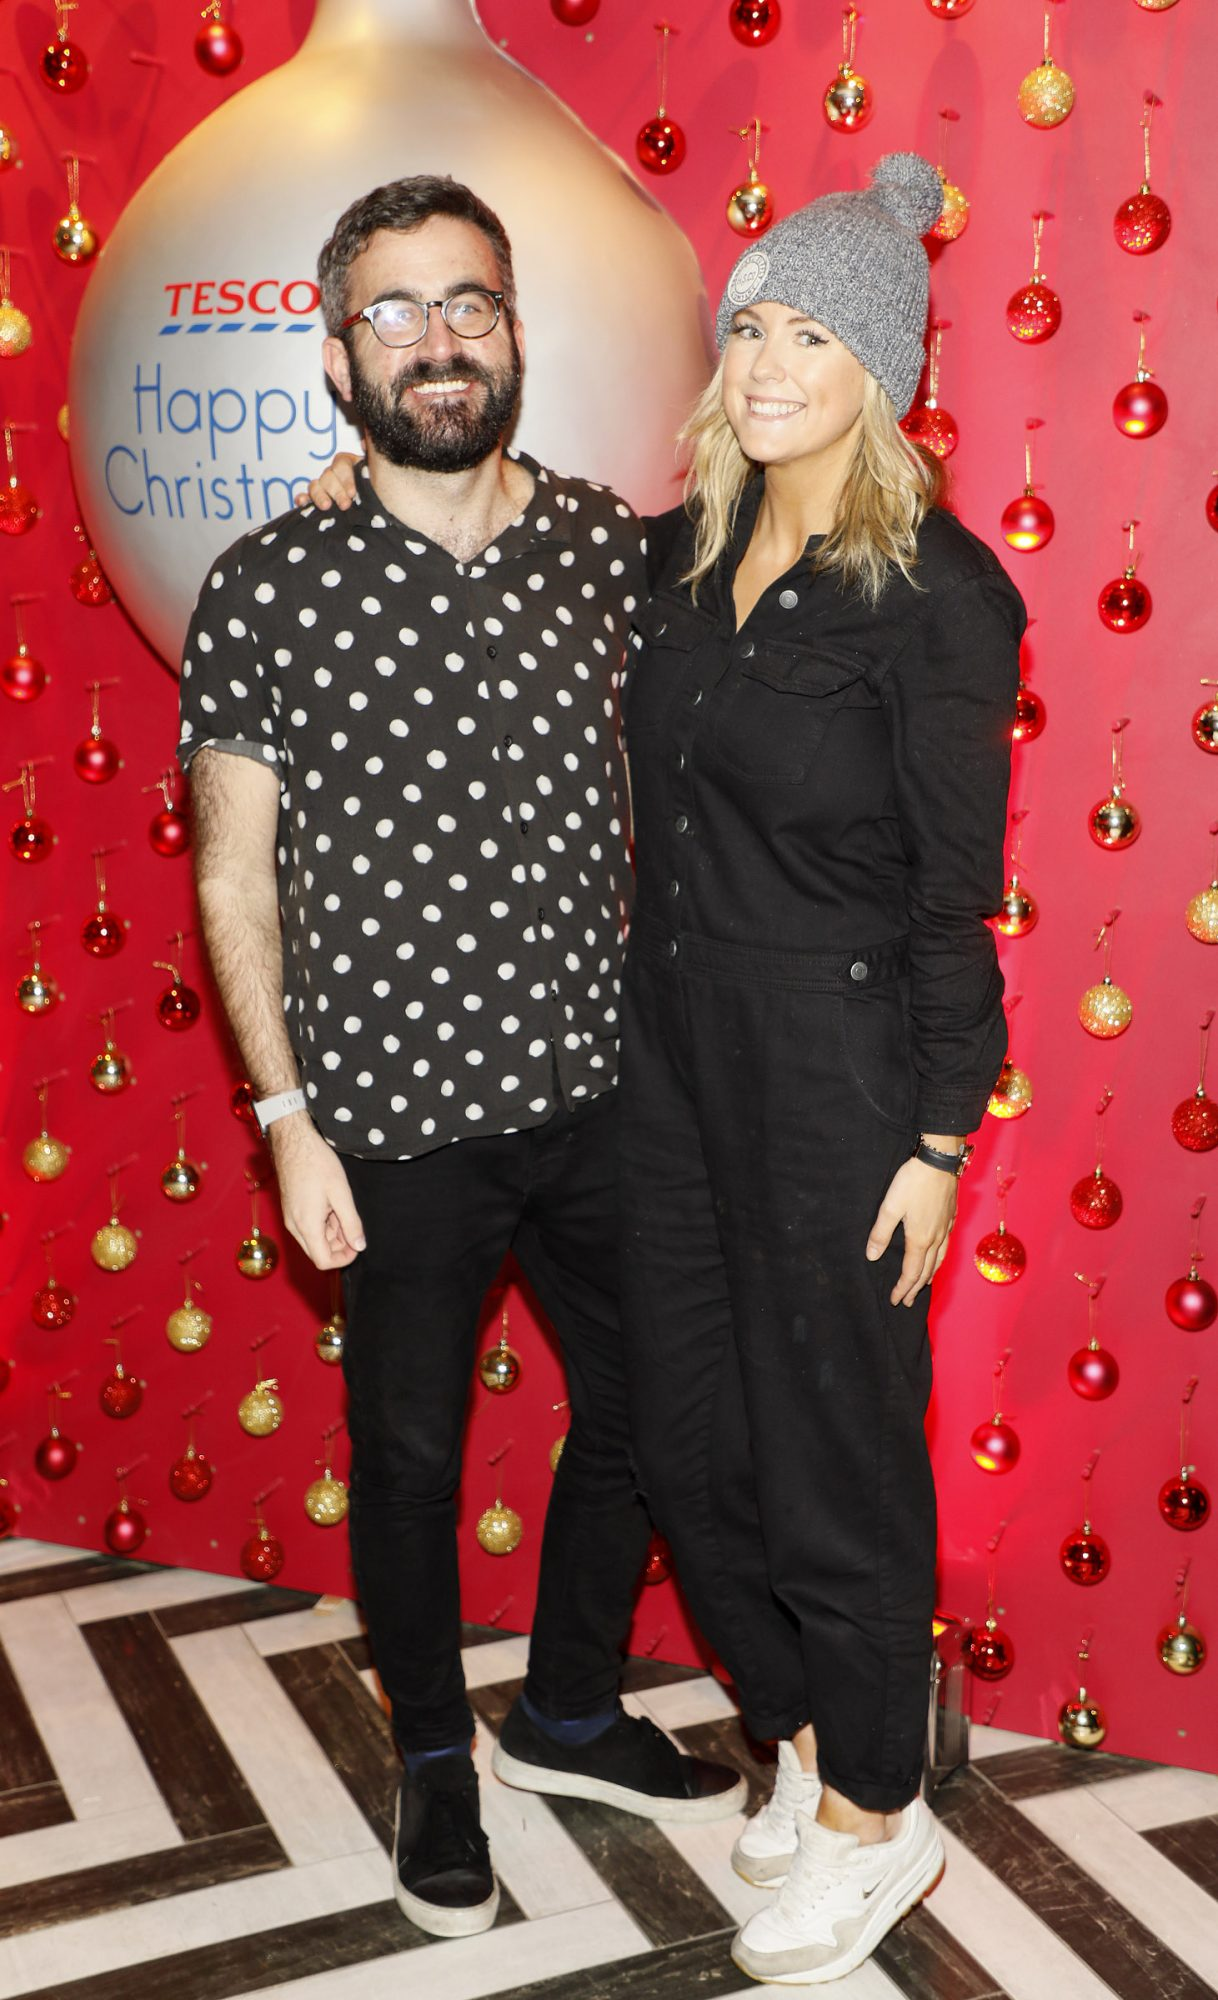 Patrick Kavanagh and Cassie Stokes at the Tesco 2019 Christmas Showcase in Dublin's Iveagh Garden Hotel.   Photo: Kieran Harnett